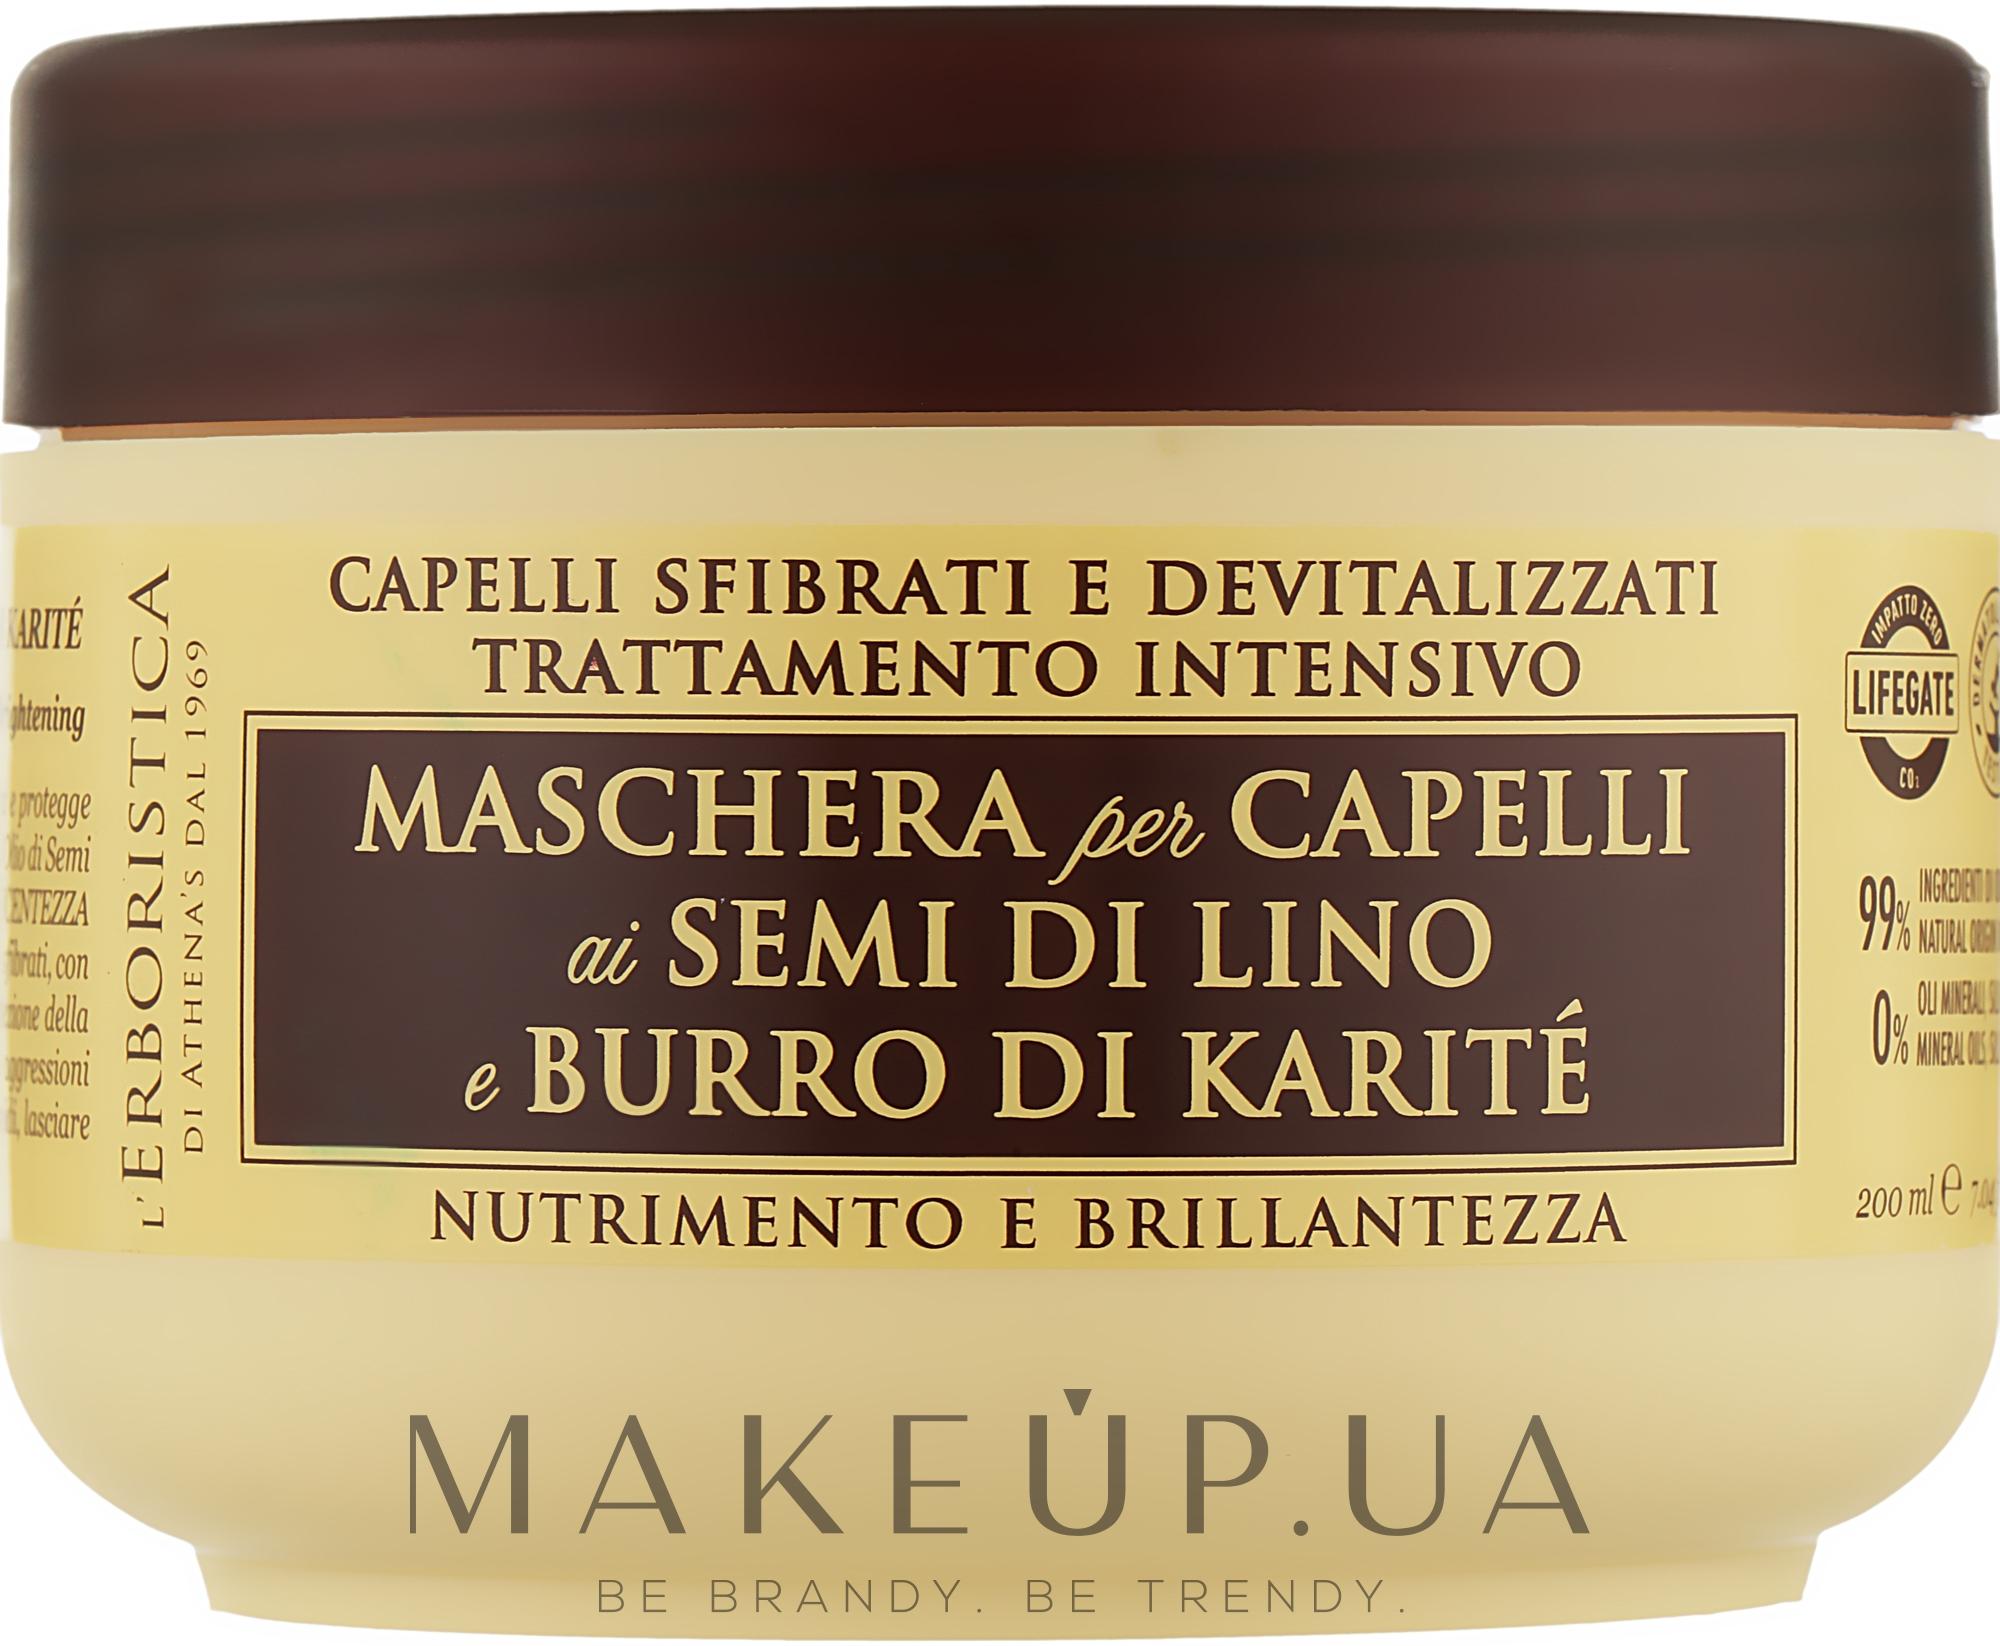 Маска для волосся з насінням льону і маслом Ши - athena's Erboristica Hair Mask Linseed & Shea Butter — фото 200ml